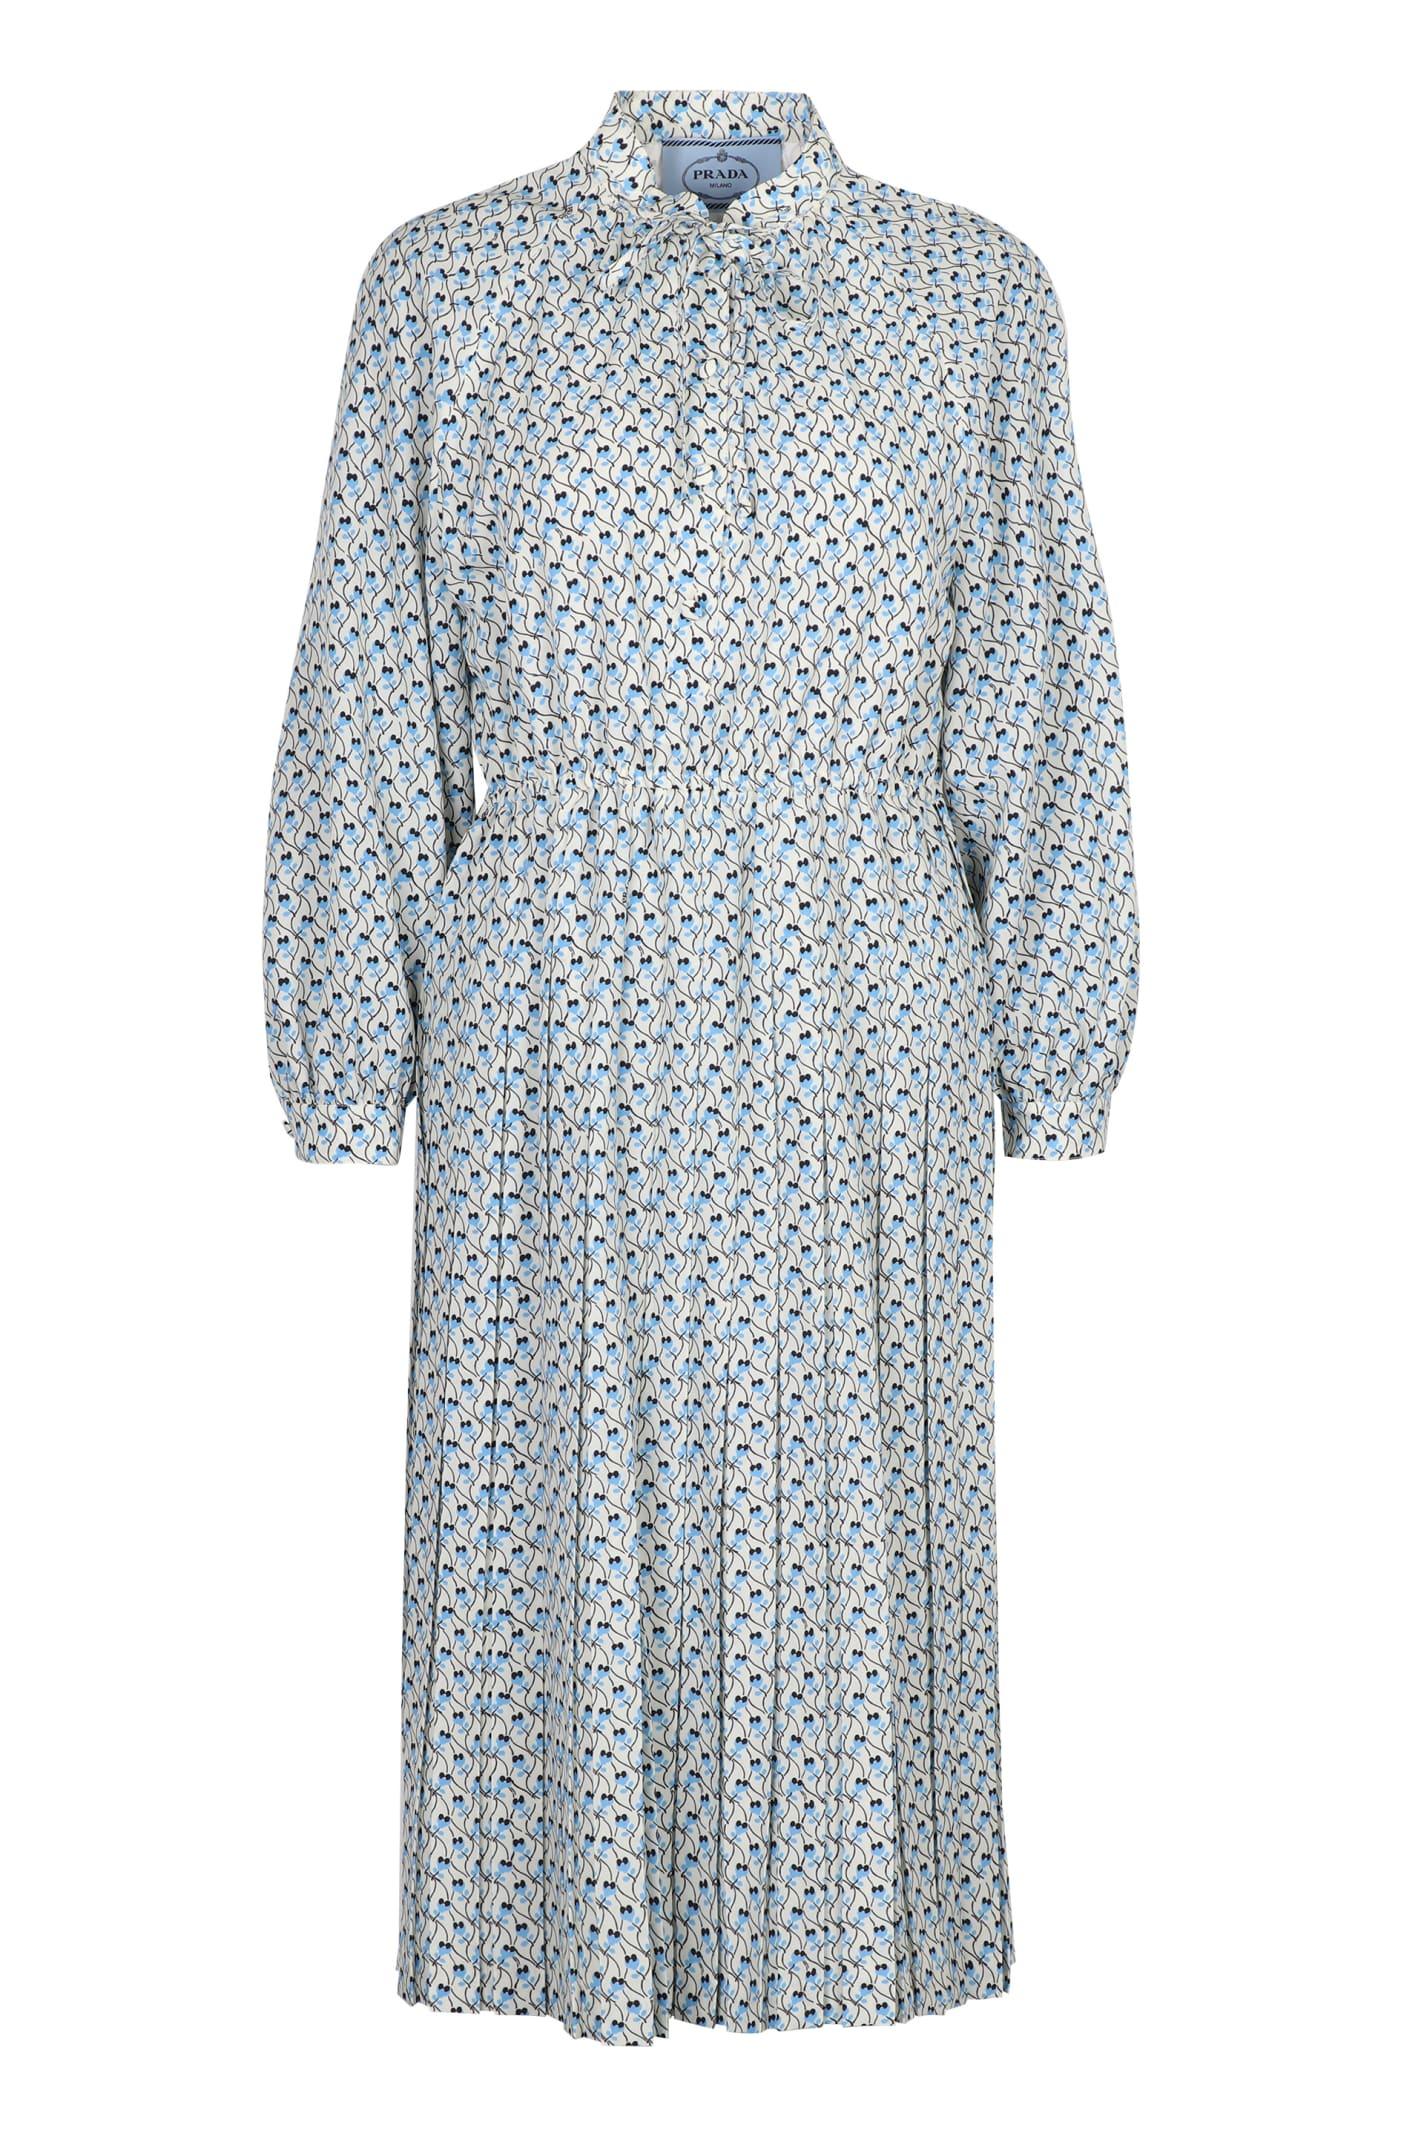 Buy Prada Floral Print Crepe Dress online, shop Prada with free shipping